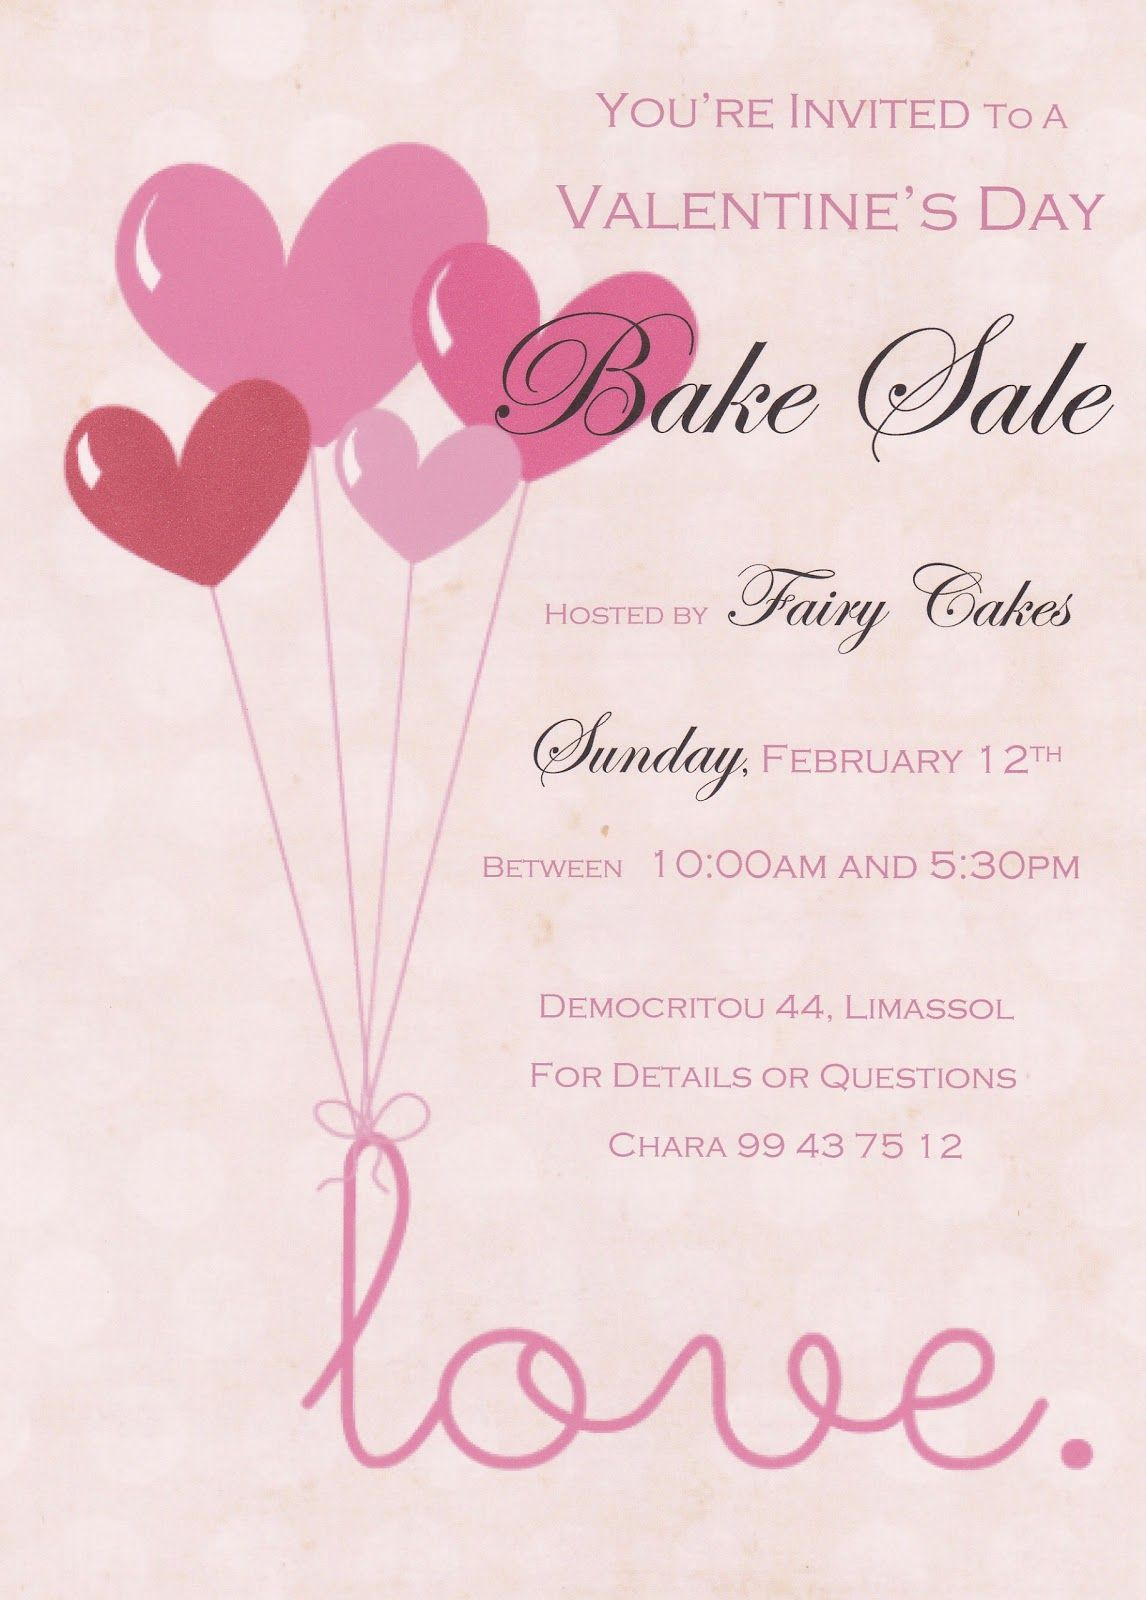 ValentineBakeSaleFlyer  Flyers    Bake Sale Flyer